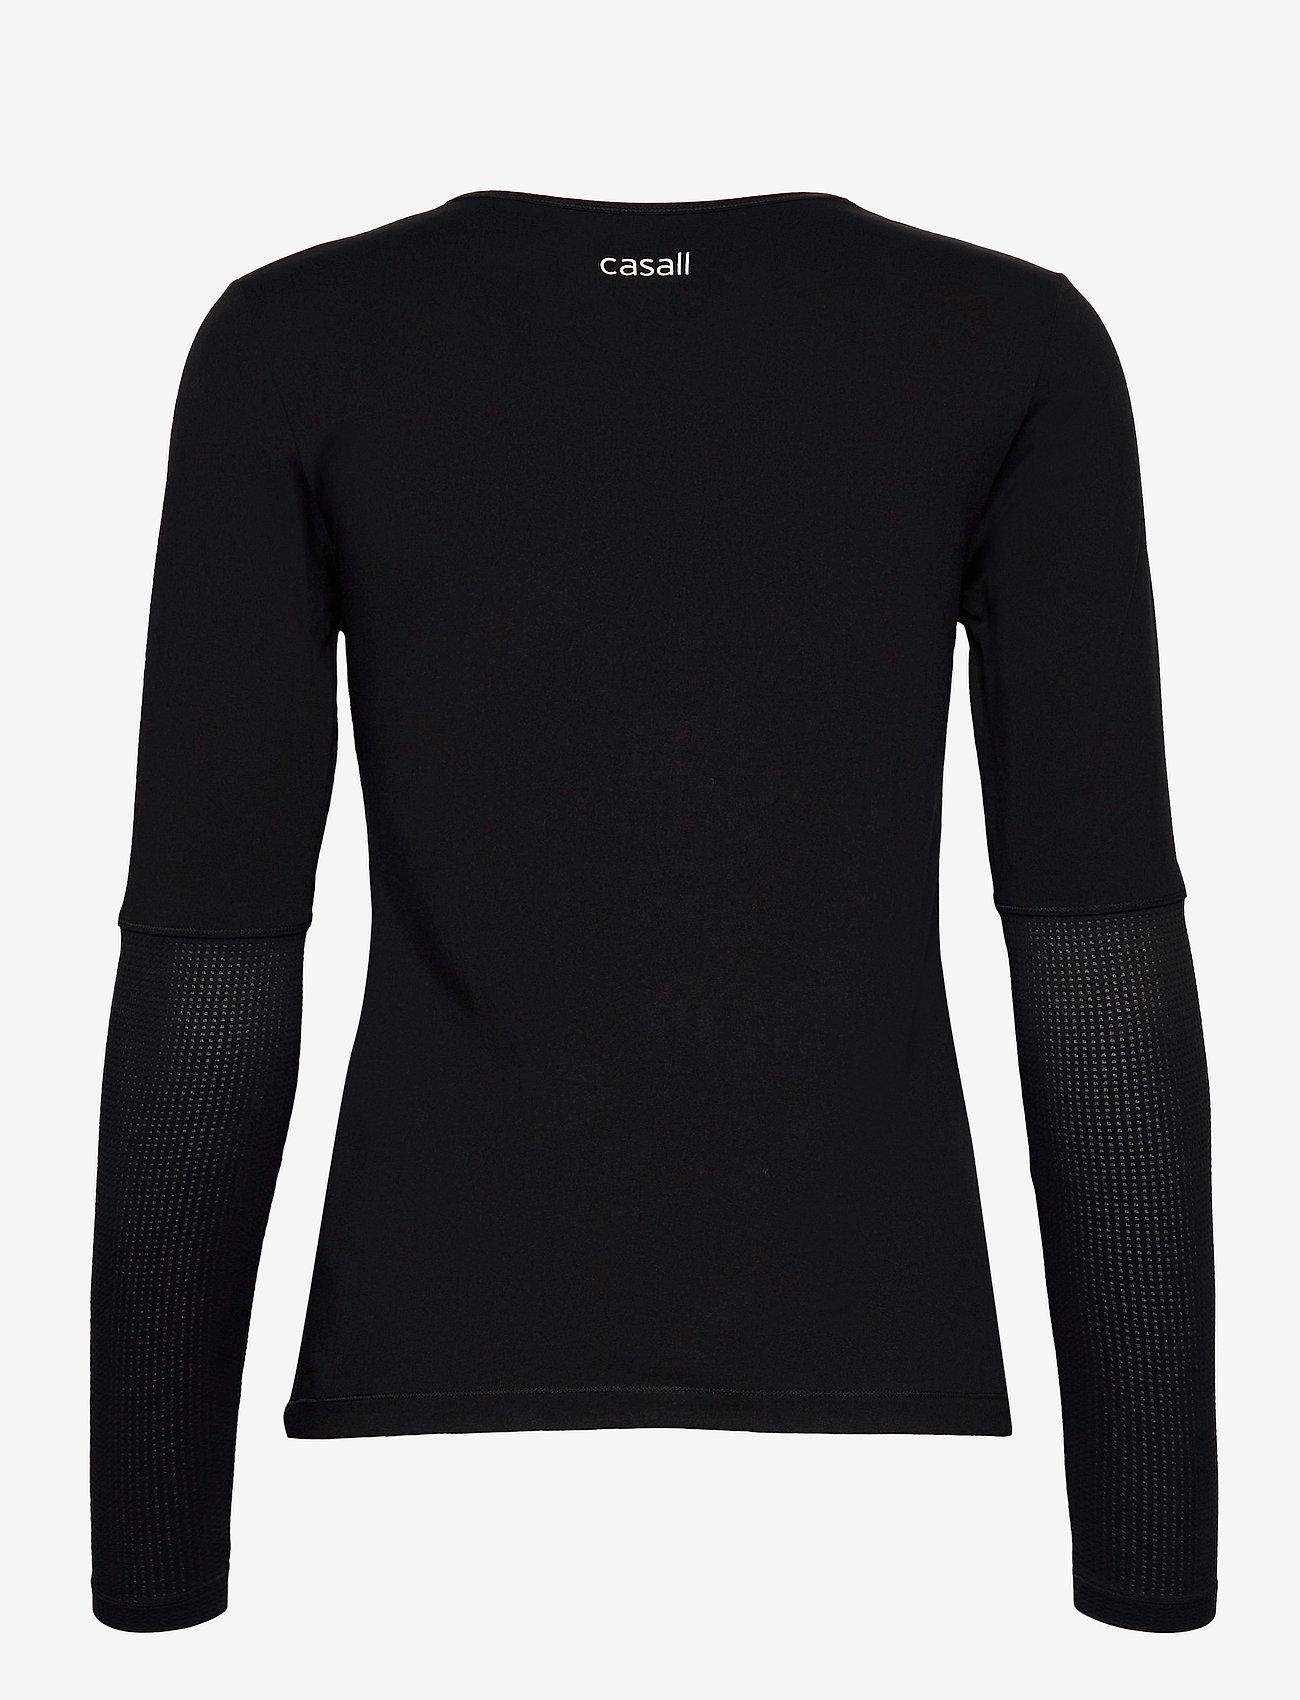 Casall - Iconic Long Sleeve - topjes met lange mouwen - black - 1